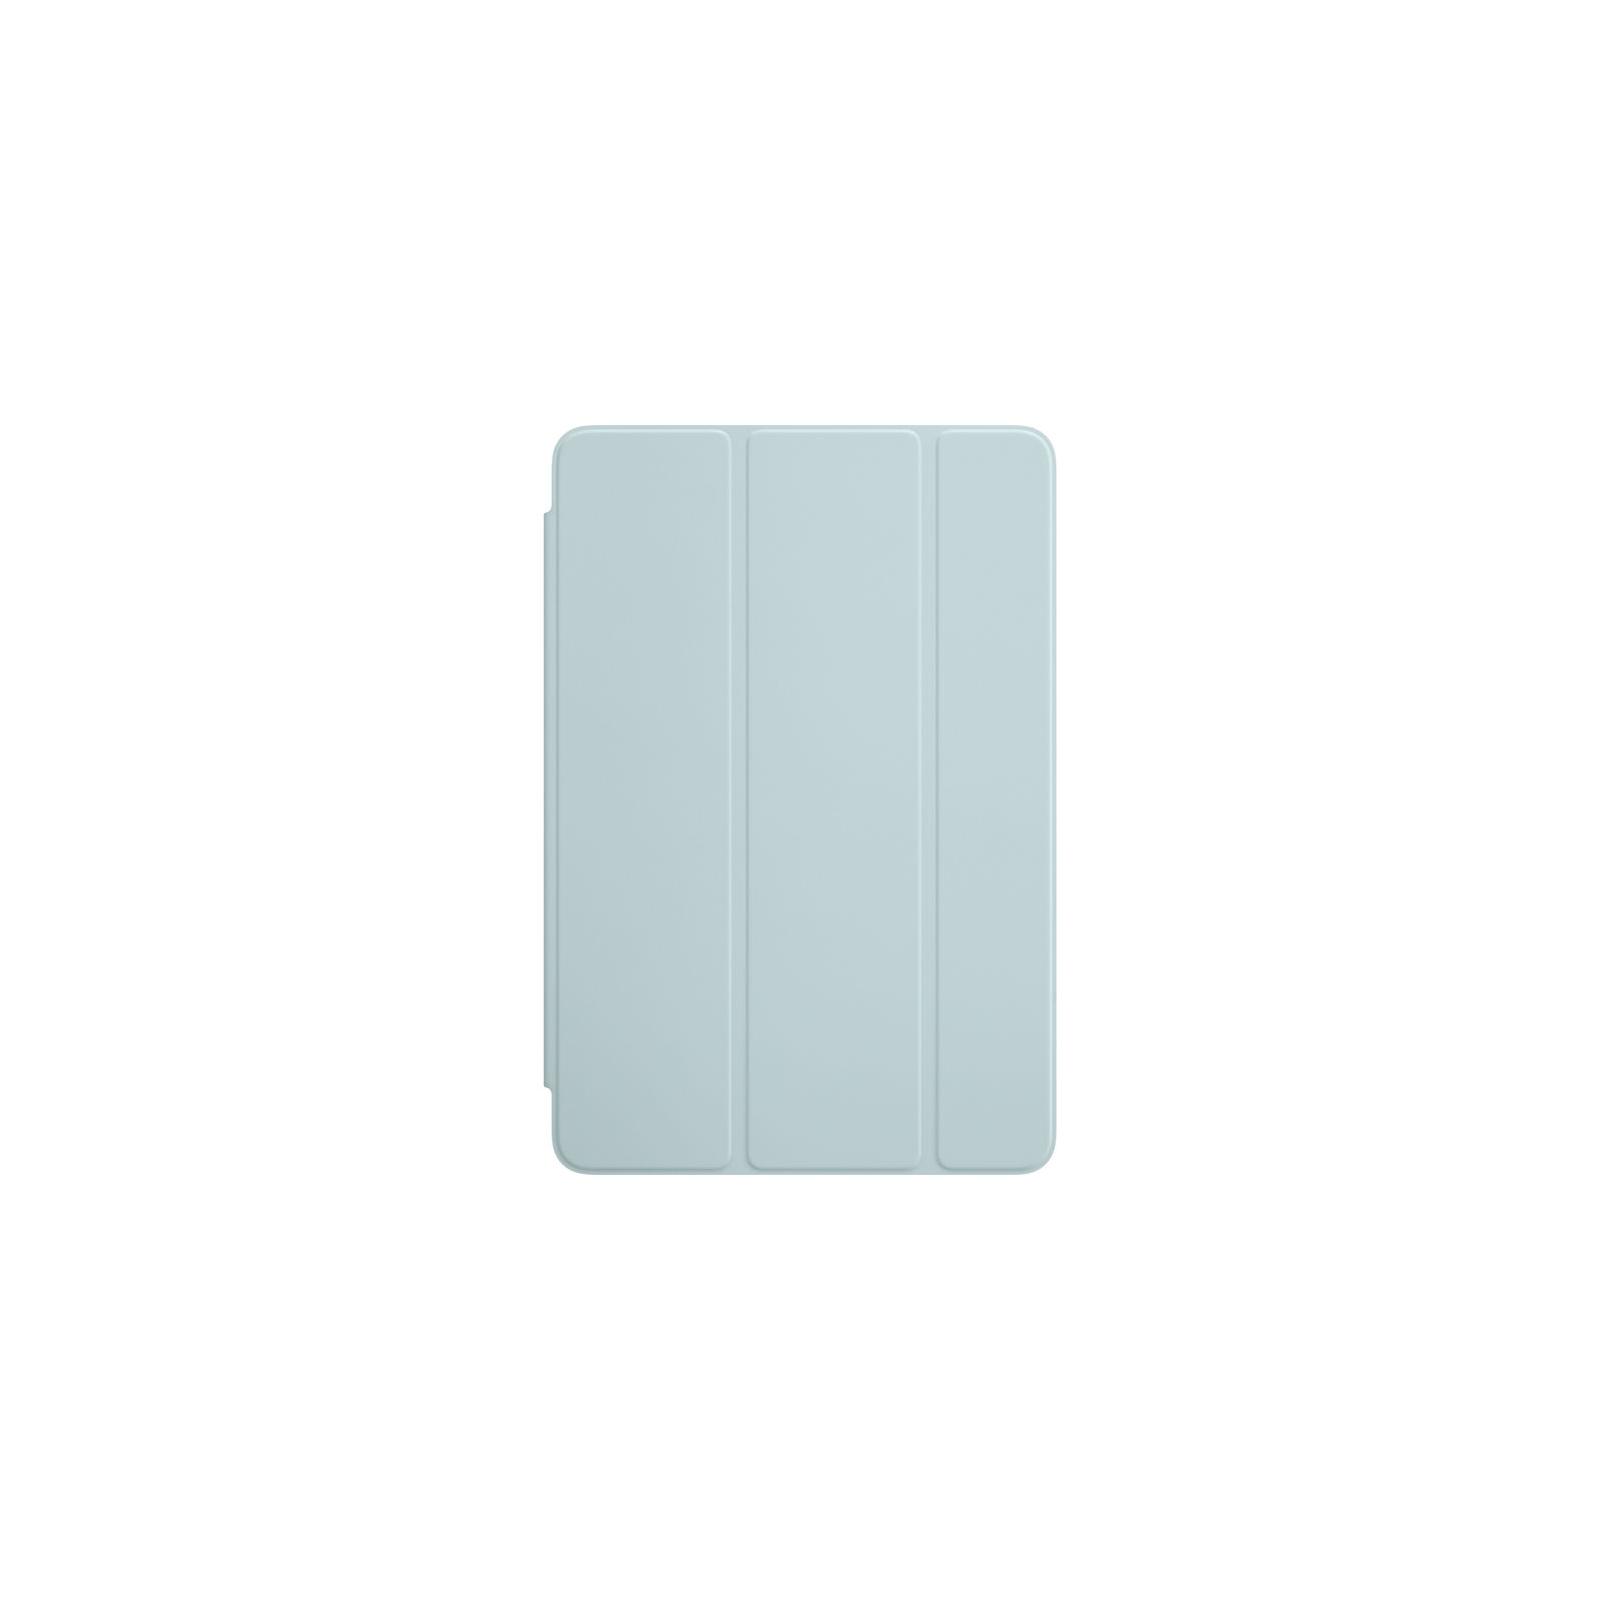 Чехол для планшета Apple Smart Cover для iPad mini 4 Turquoise (MKM52ZM/A)